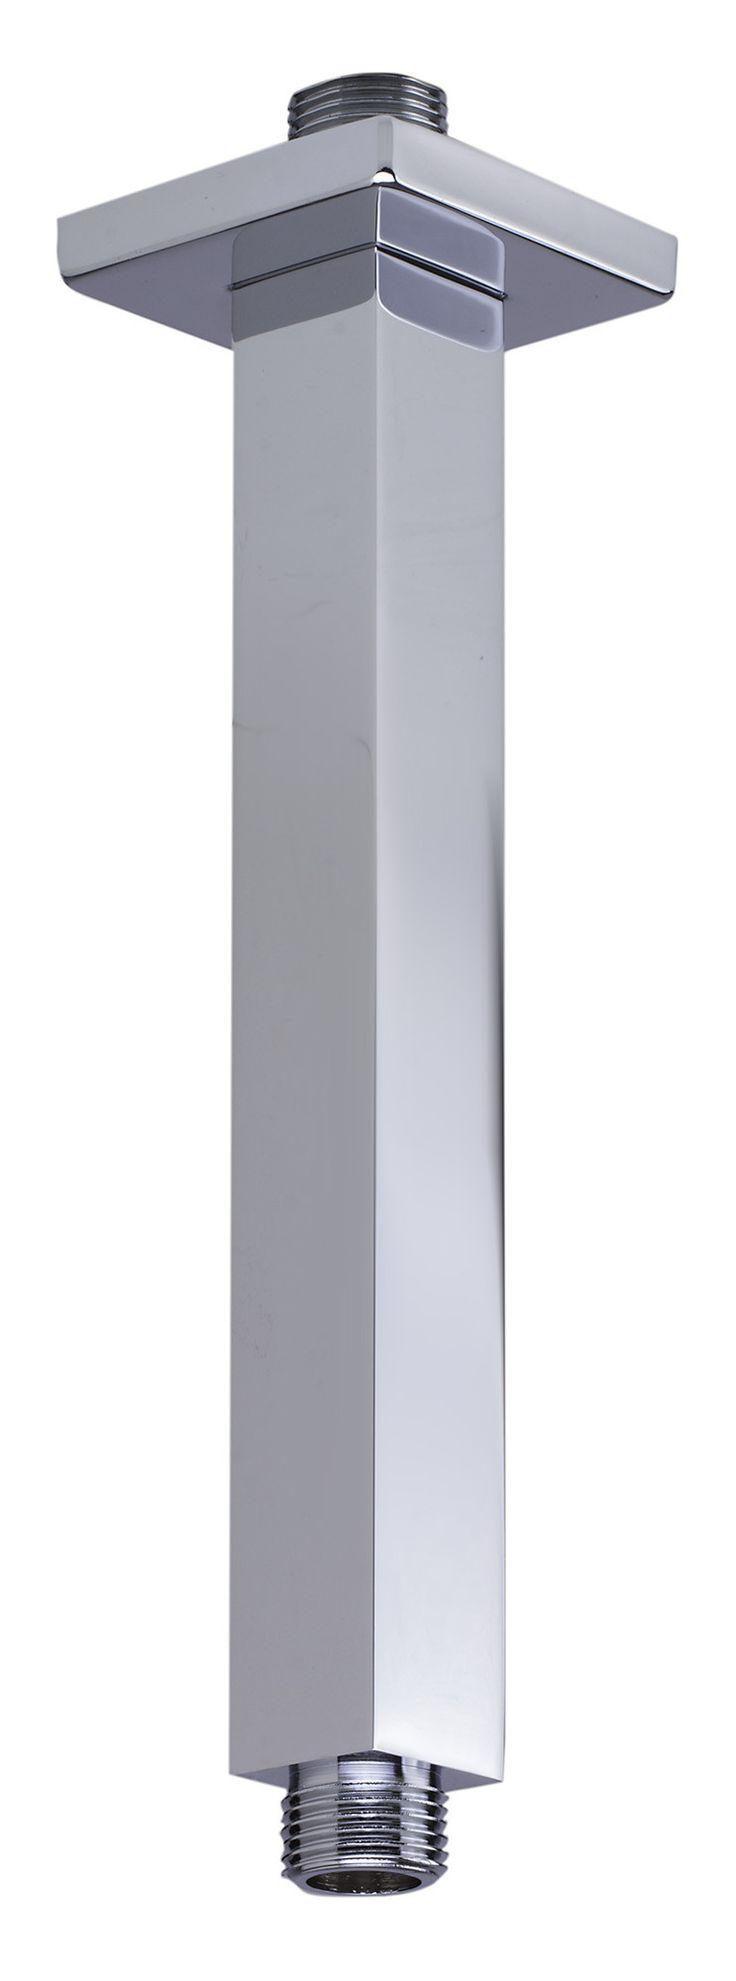 "ALFI brand AB8SC-PC 8"" Square Ceiling Mounted Chrome Shower Arm for Rain Shower Heads"